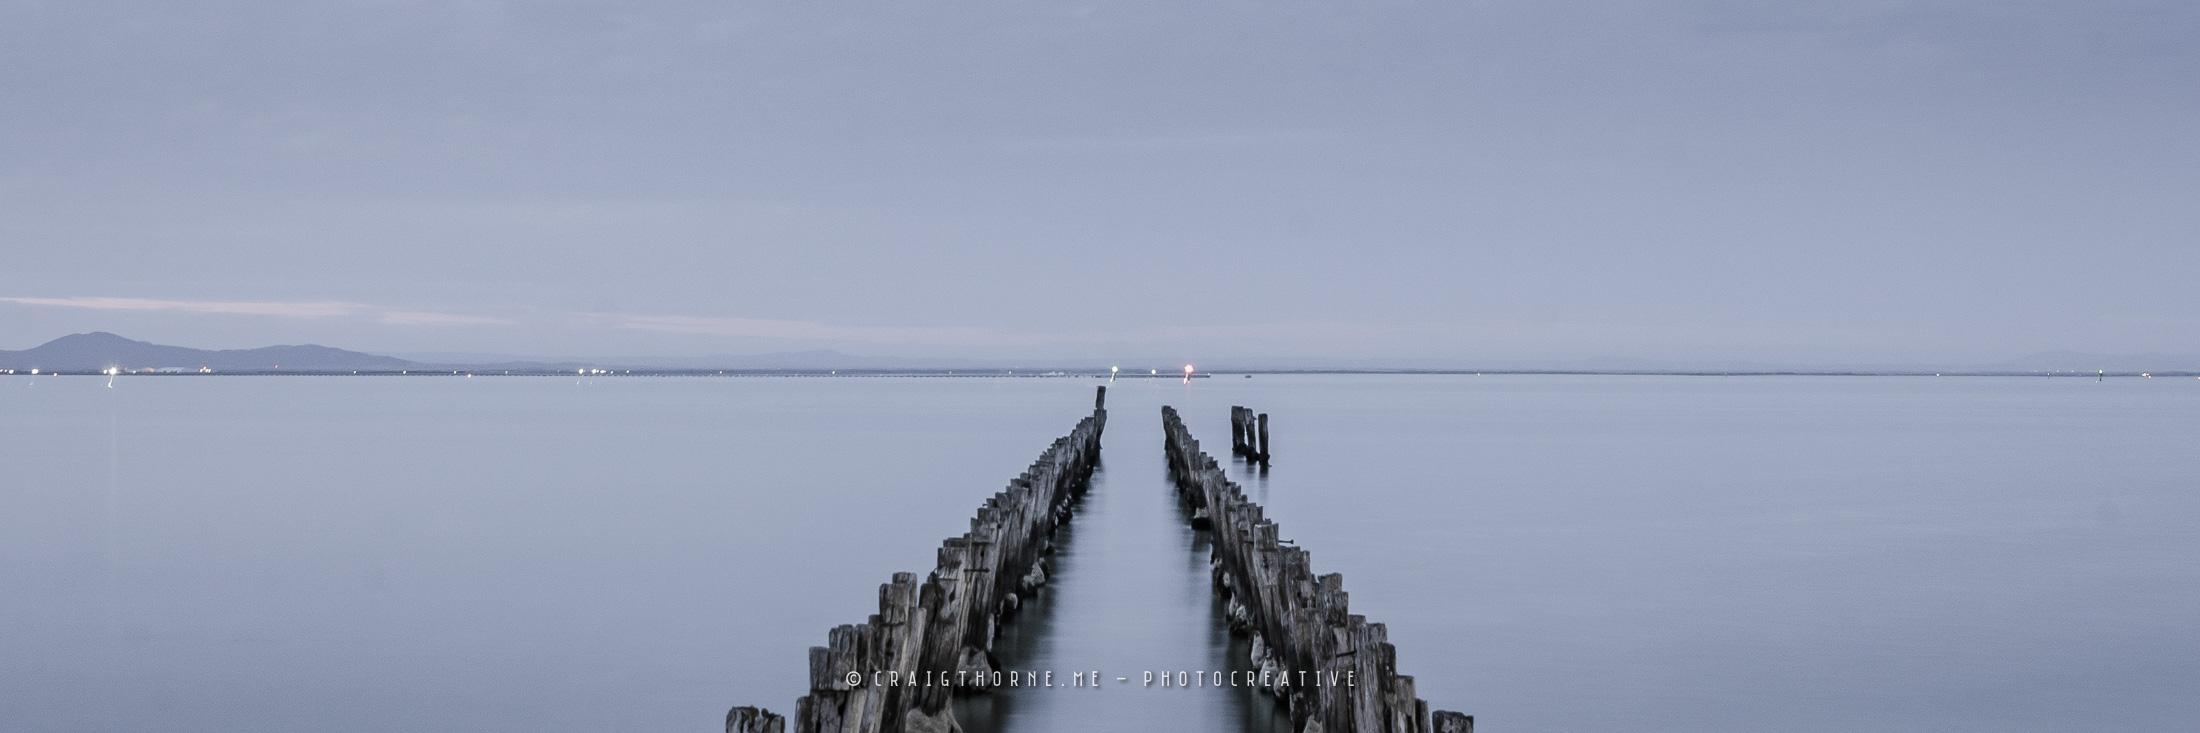 20140923-05-Panoramas-by-Craig-Thorne-THN_4780.jpg